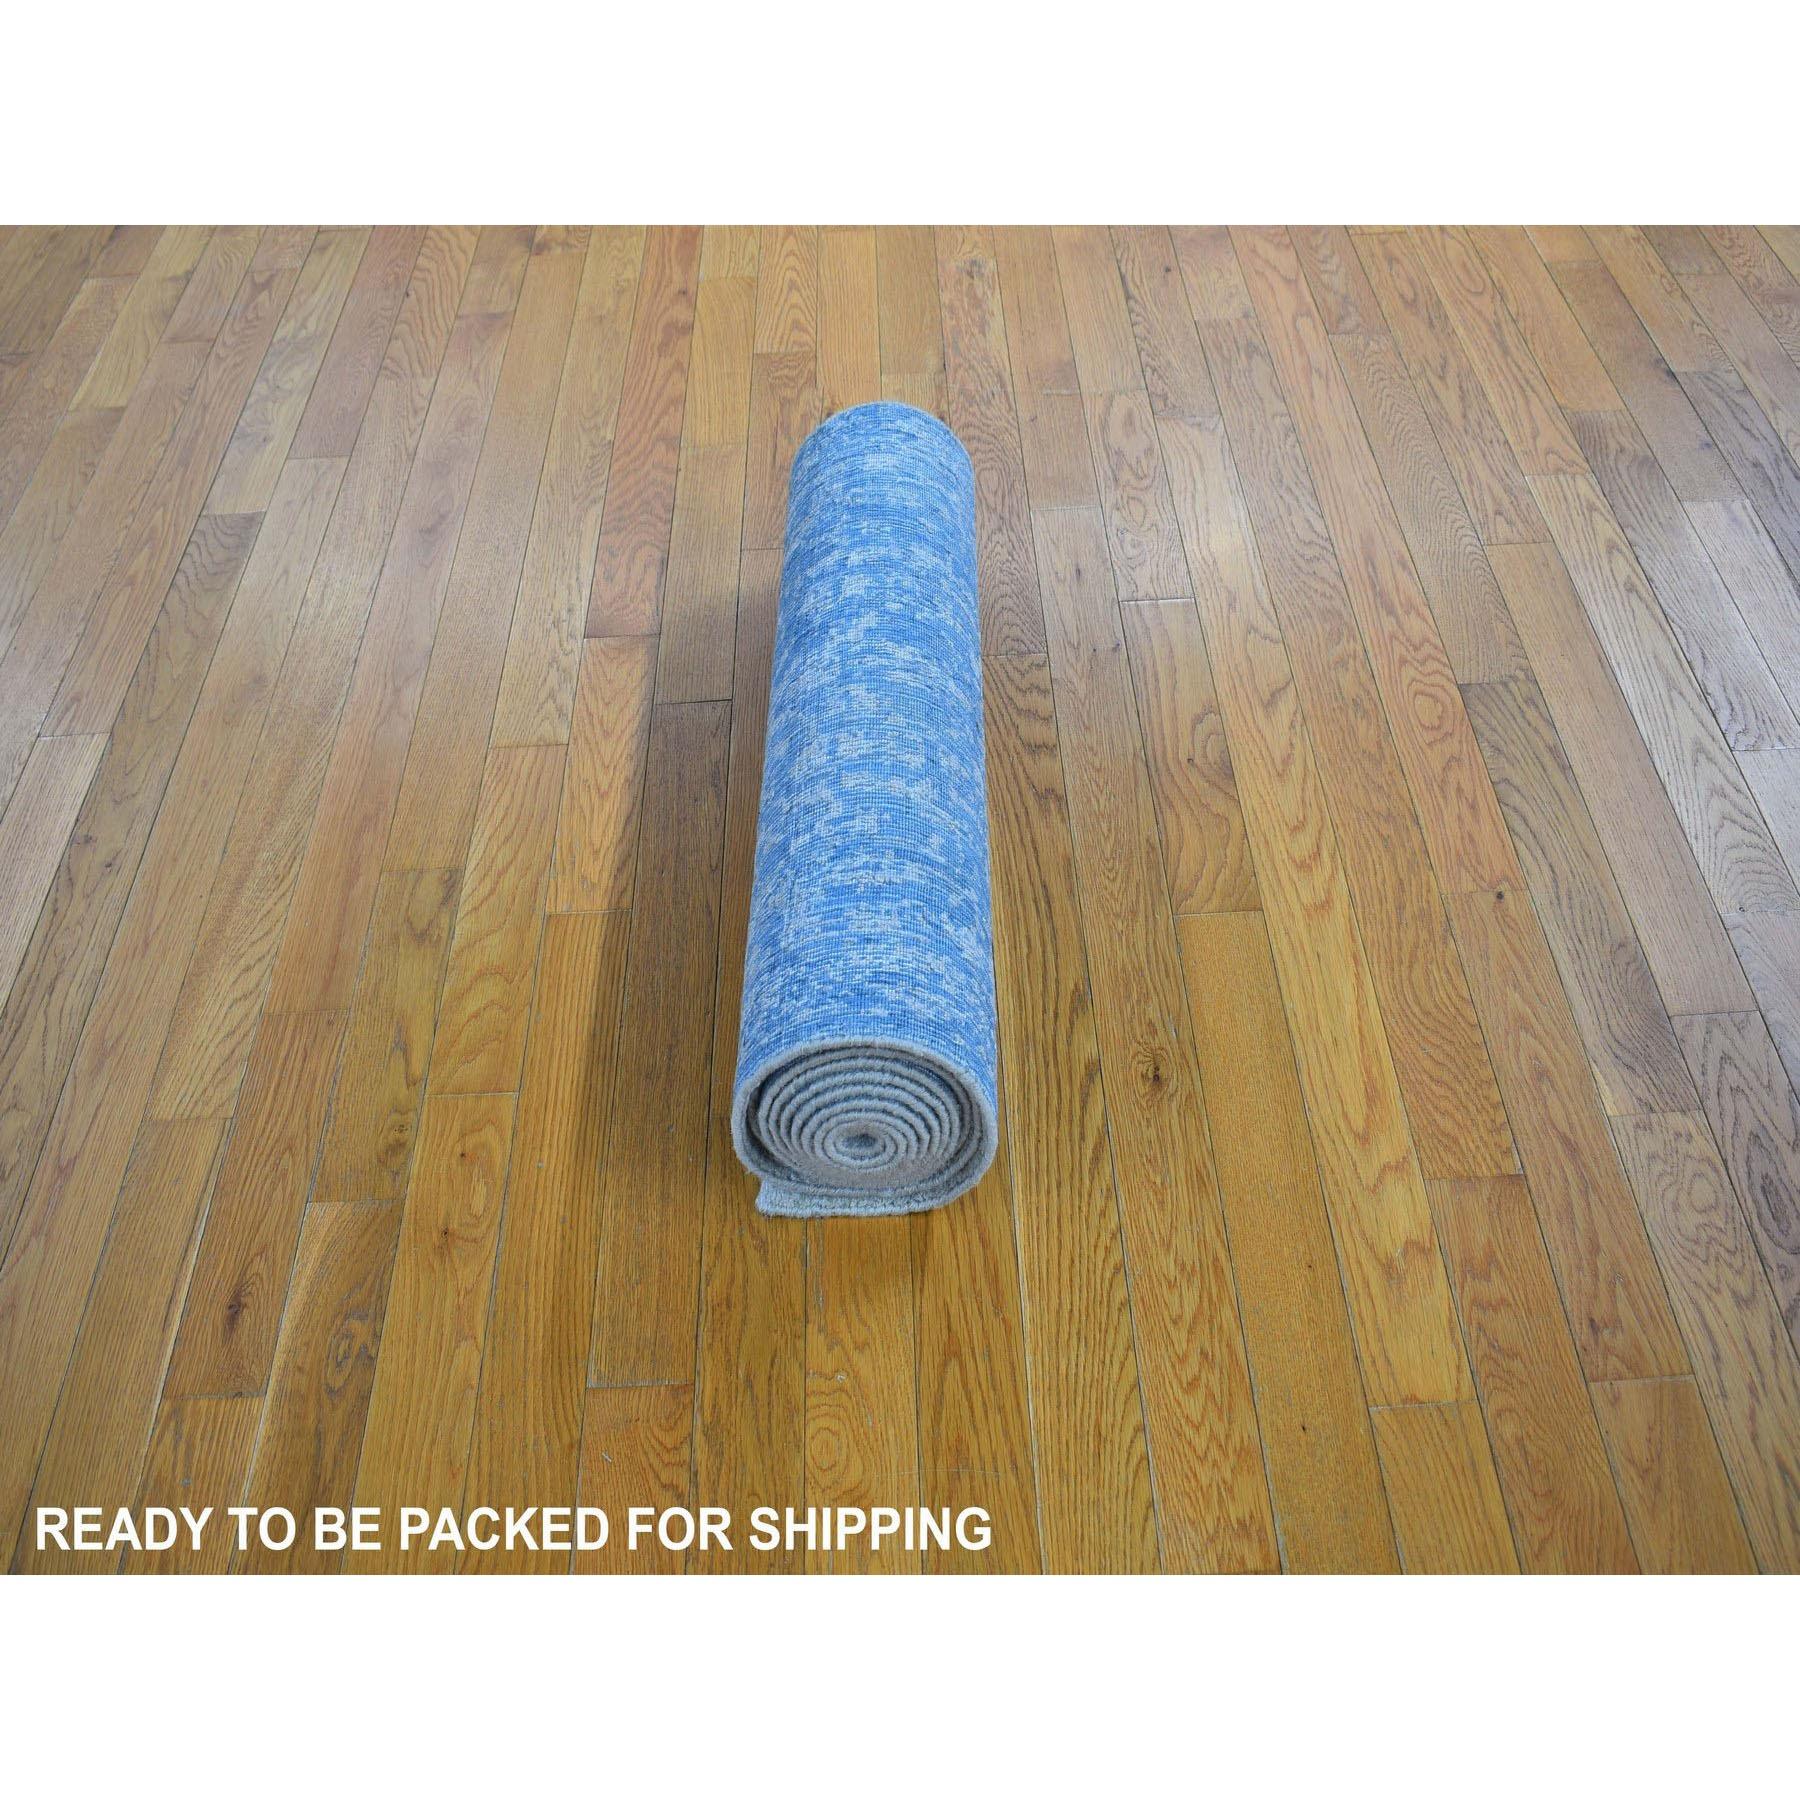 "2'6""x12'2"" Jacquard Hand Loomed Blue Broken Cypress Tree Design Silken Thick And Plush Runner Oriental Rug"